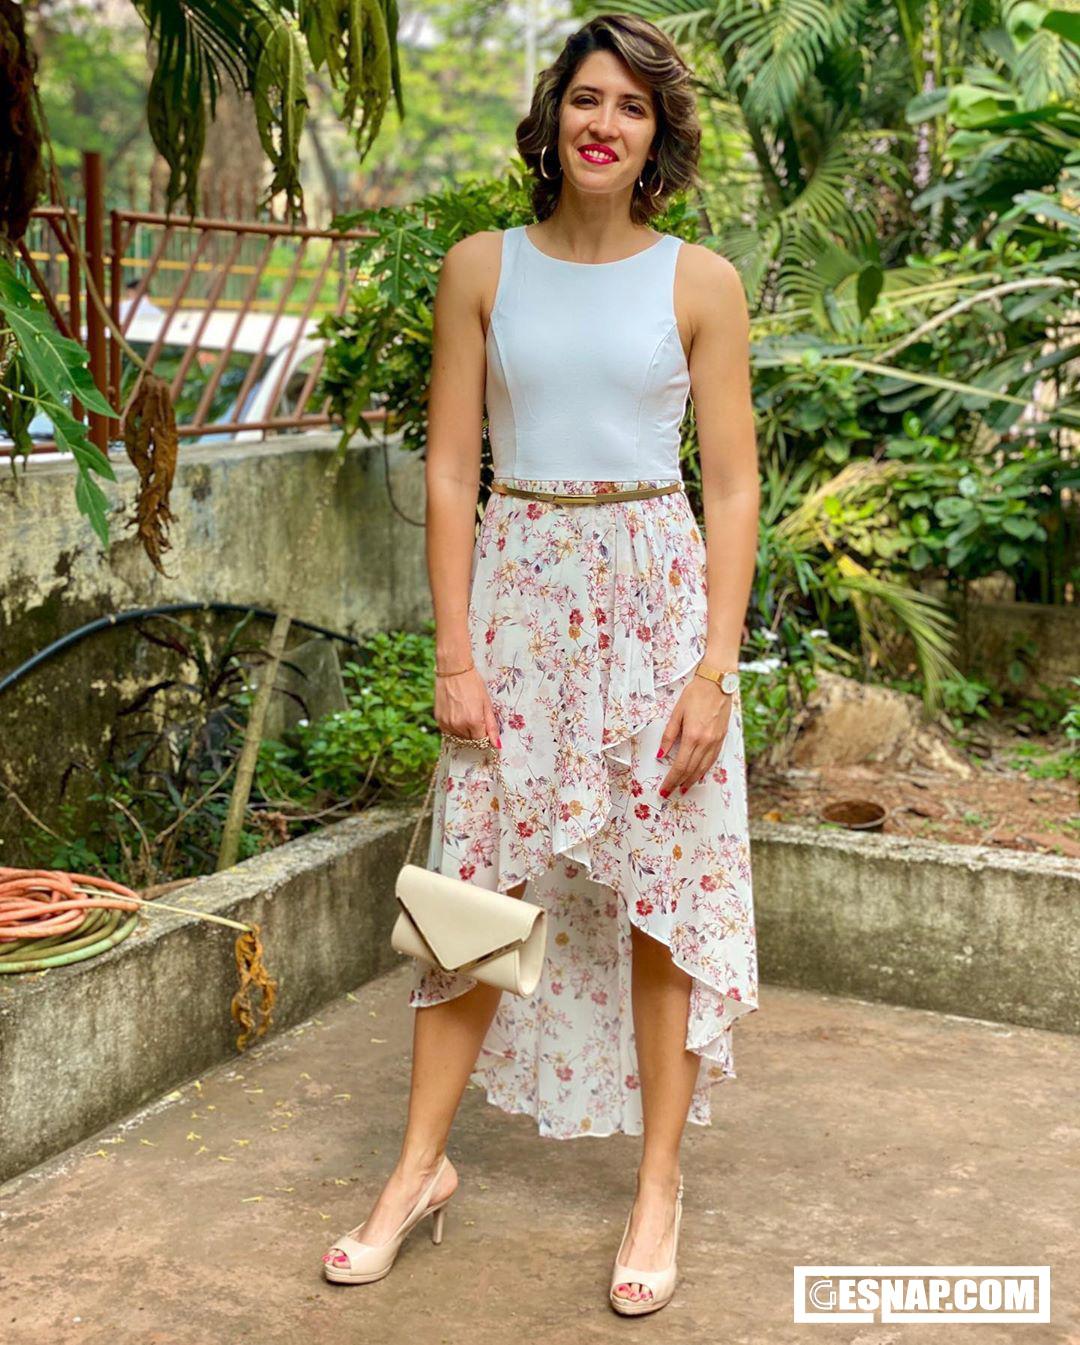 Ayesha Billimoria Photo | Gesnap.com